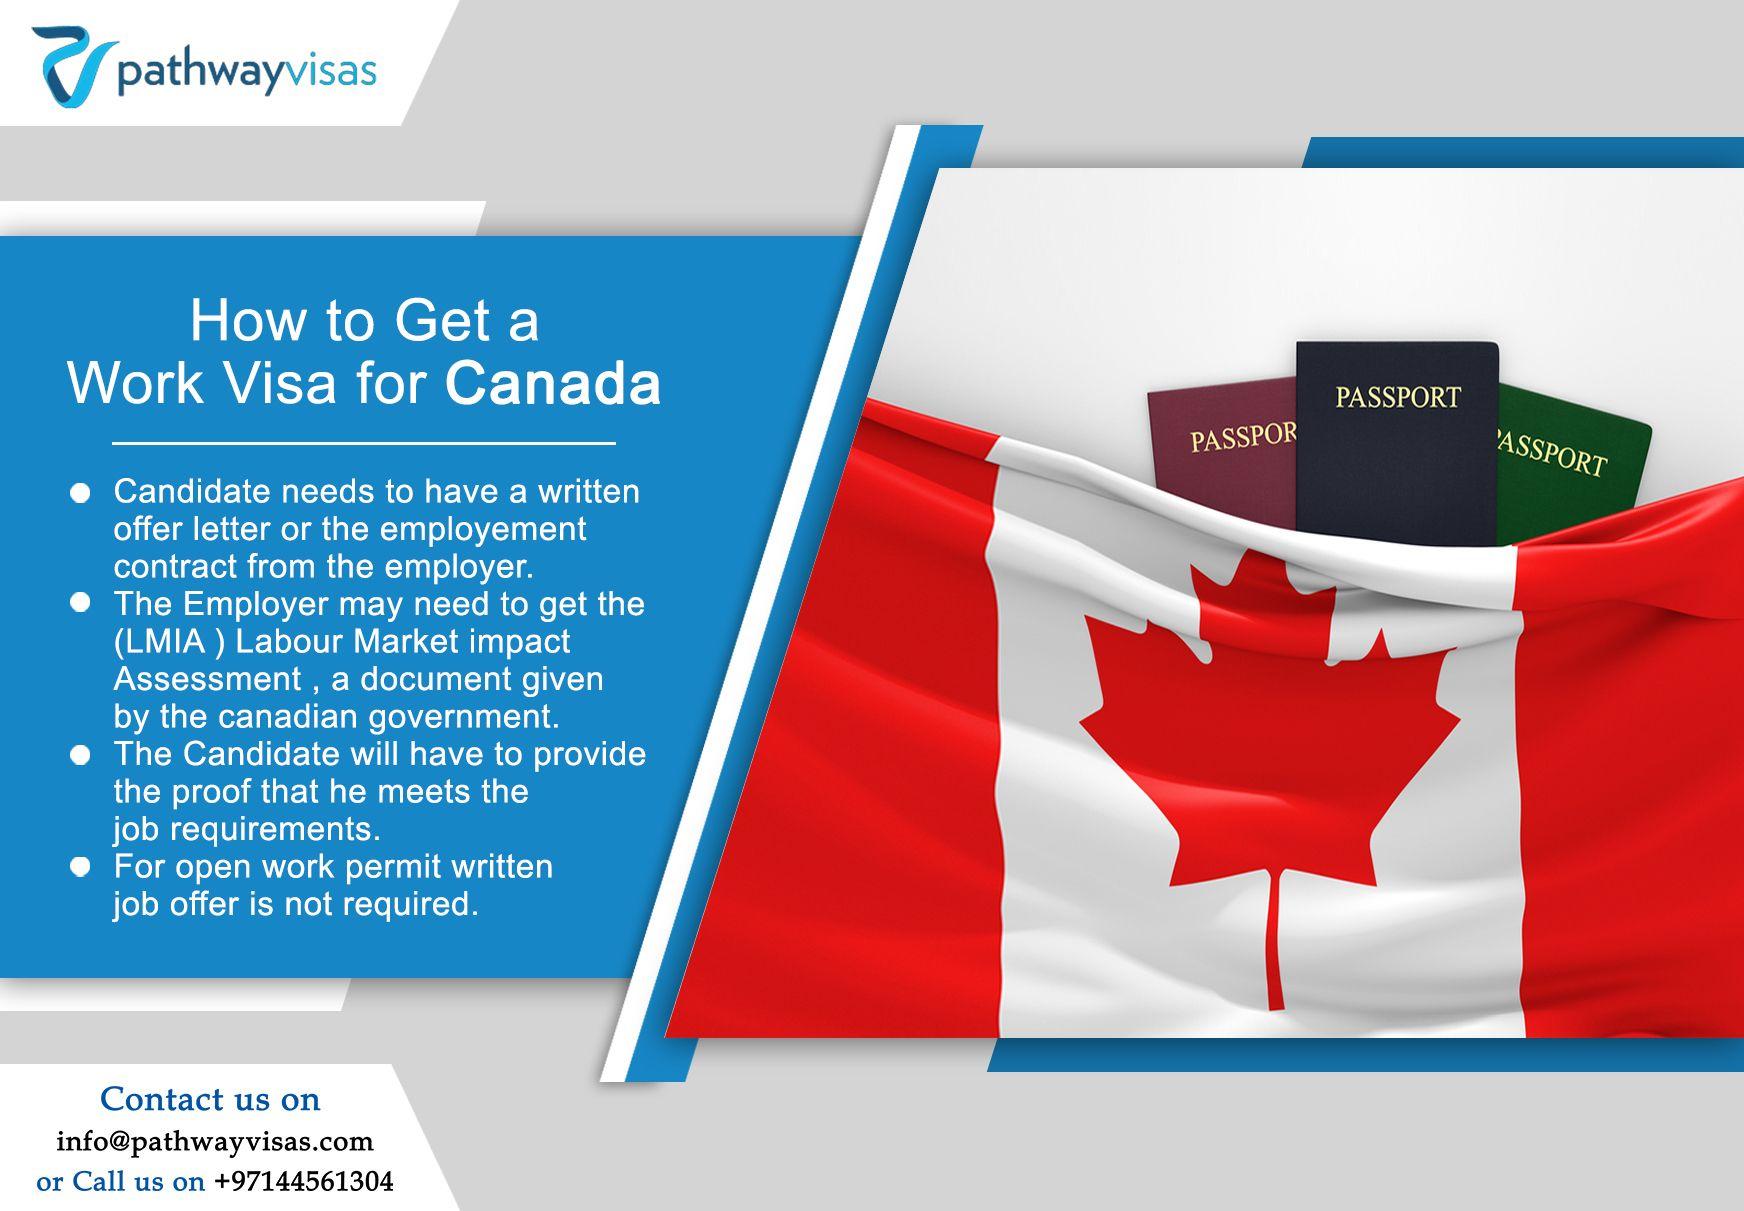 Steps to get a work #visa for #Canada  #pathwayvisas